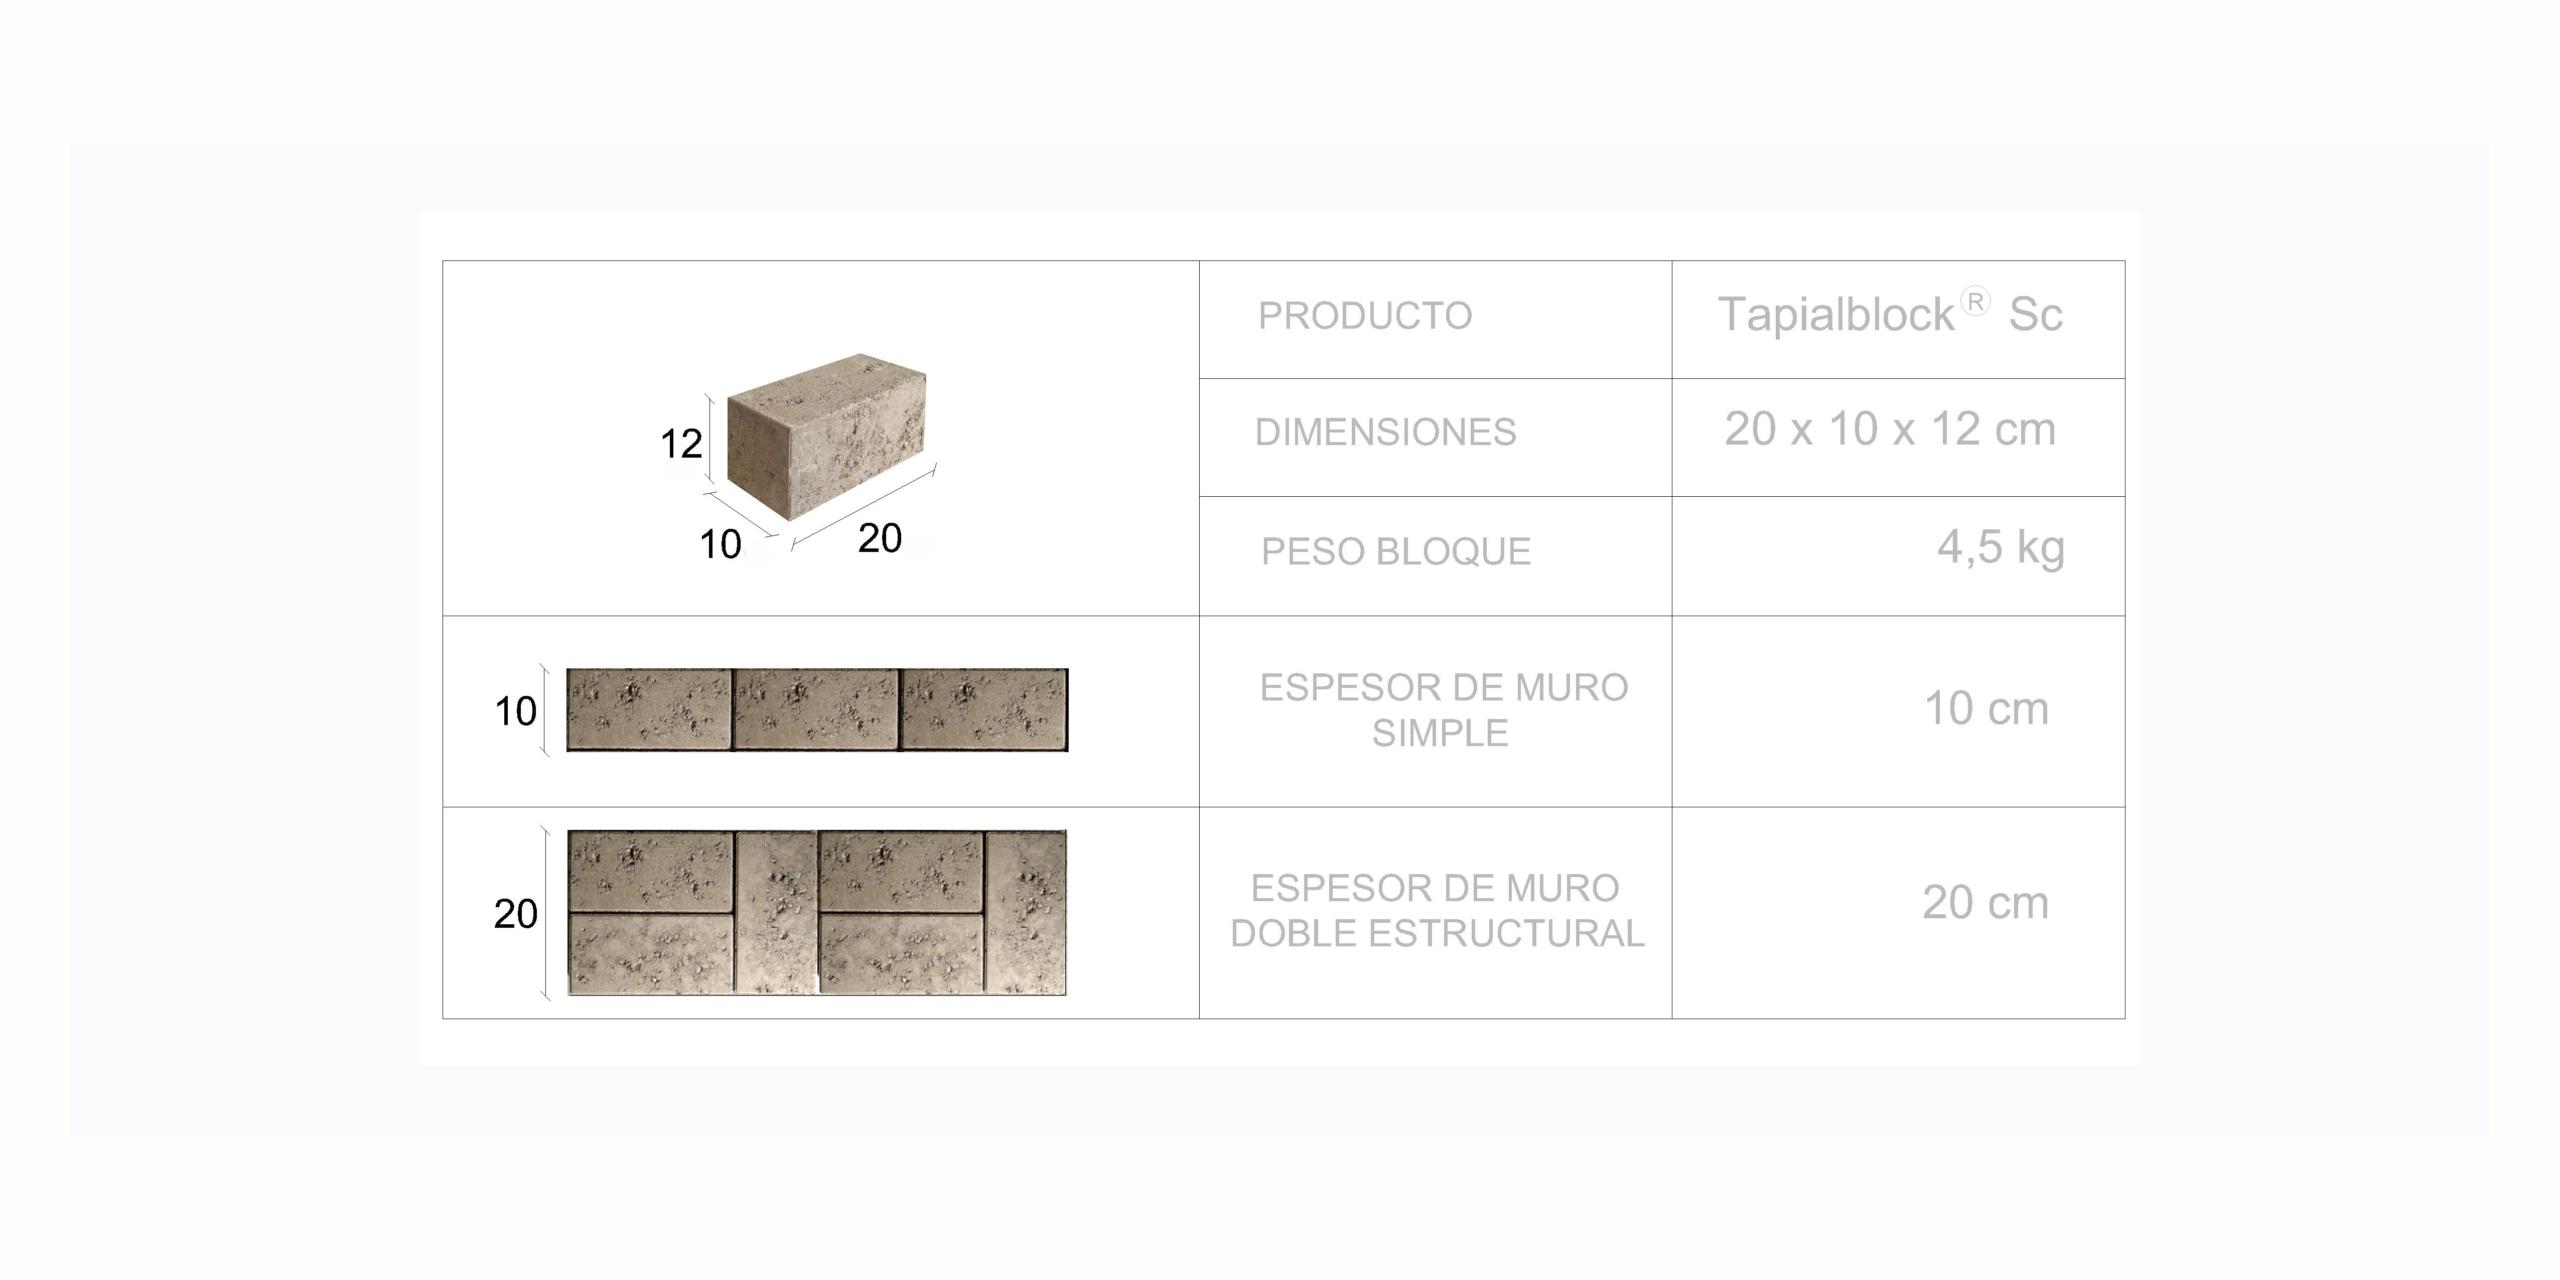 Tapialblock® SC - Fetdeterra